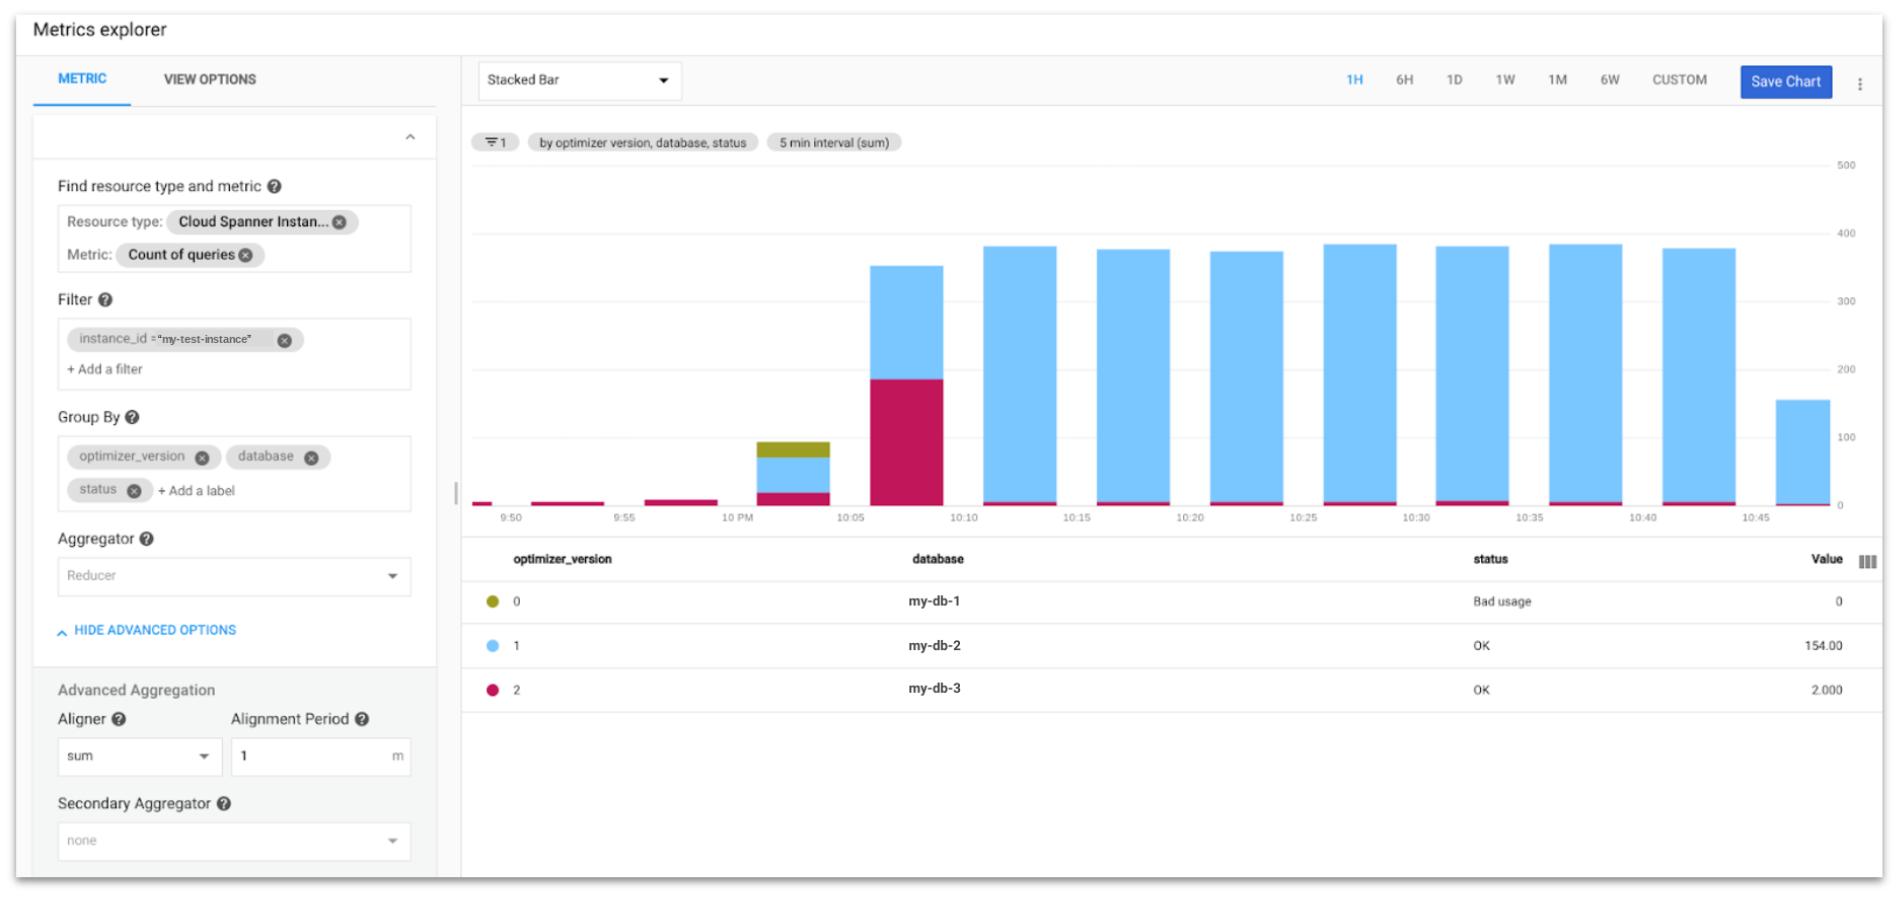 Metrics Explorer 中按查询优化器版本分组的查询计数